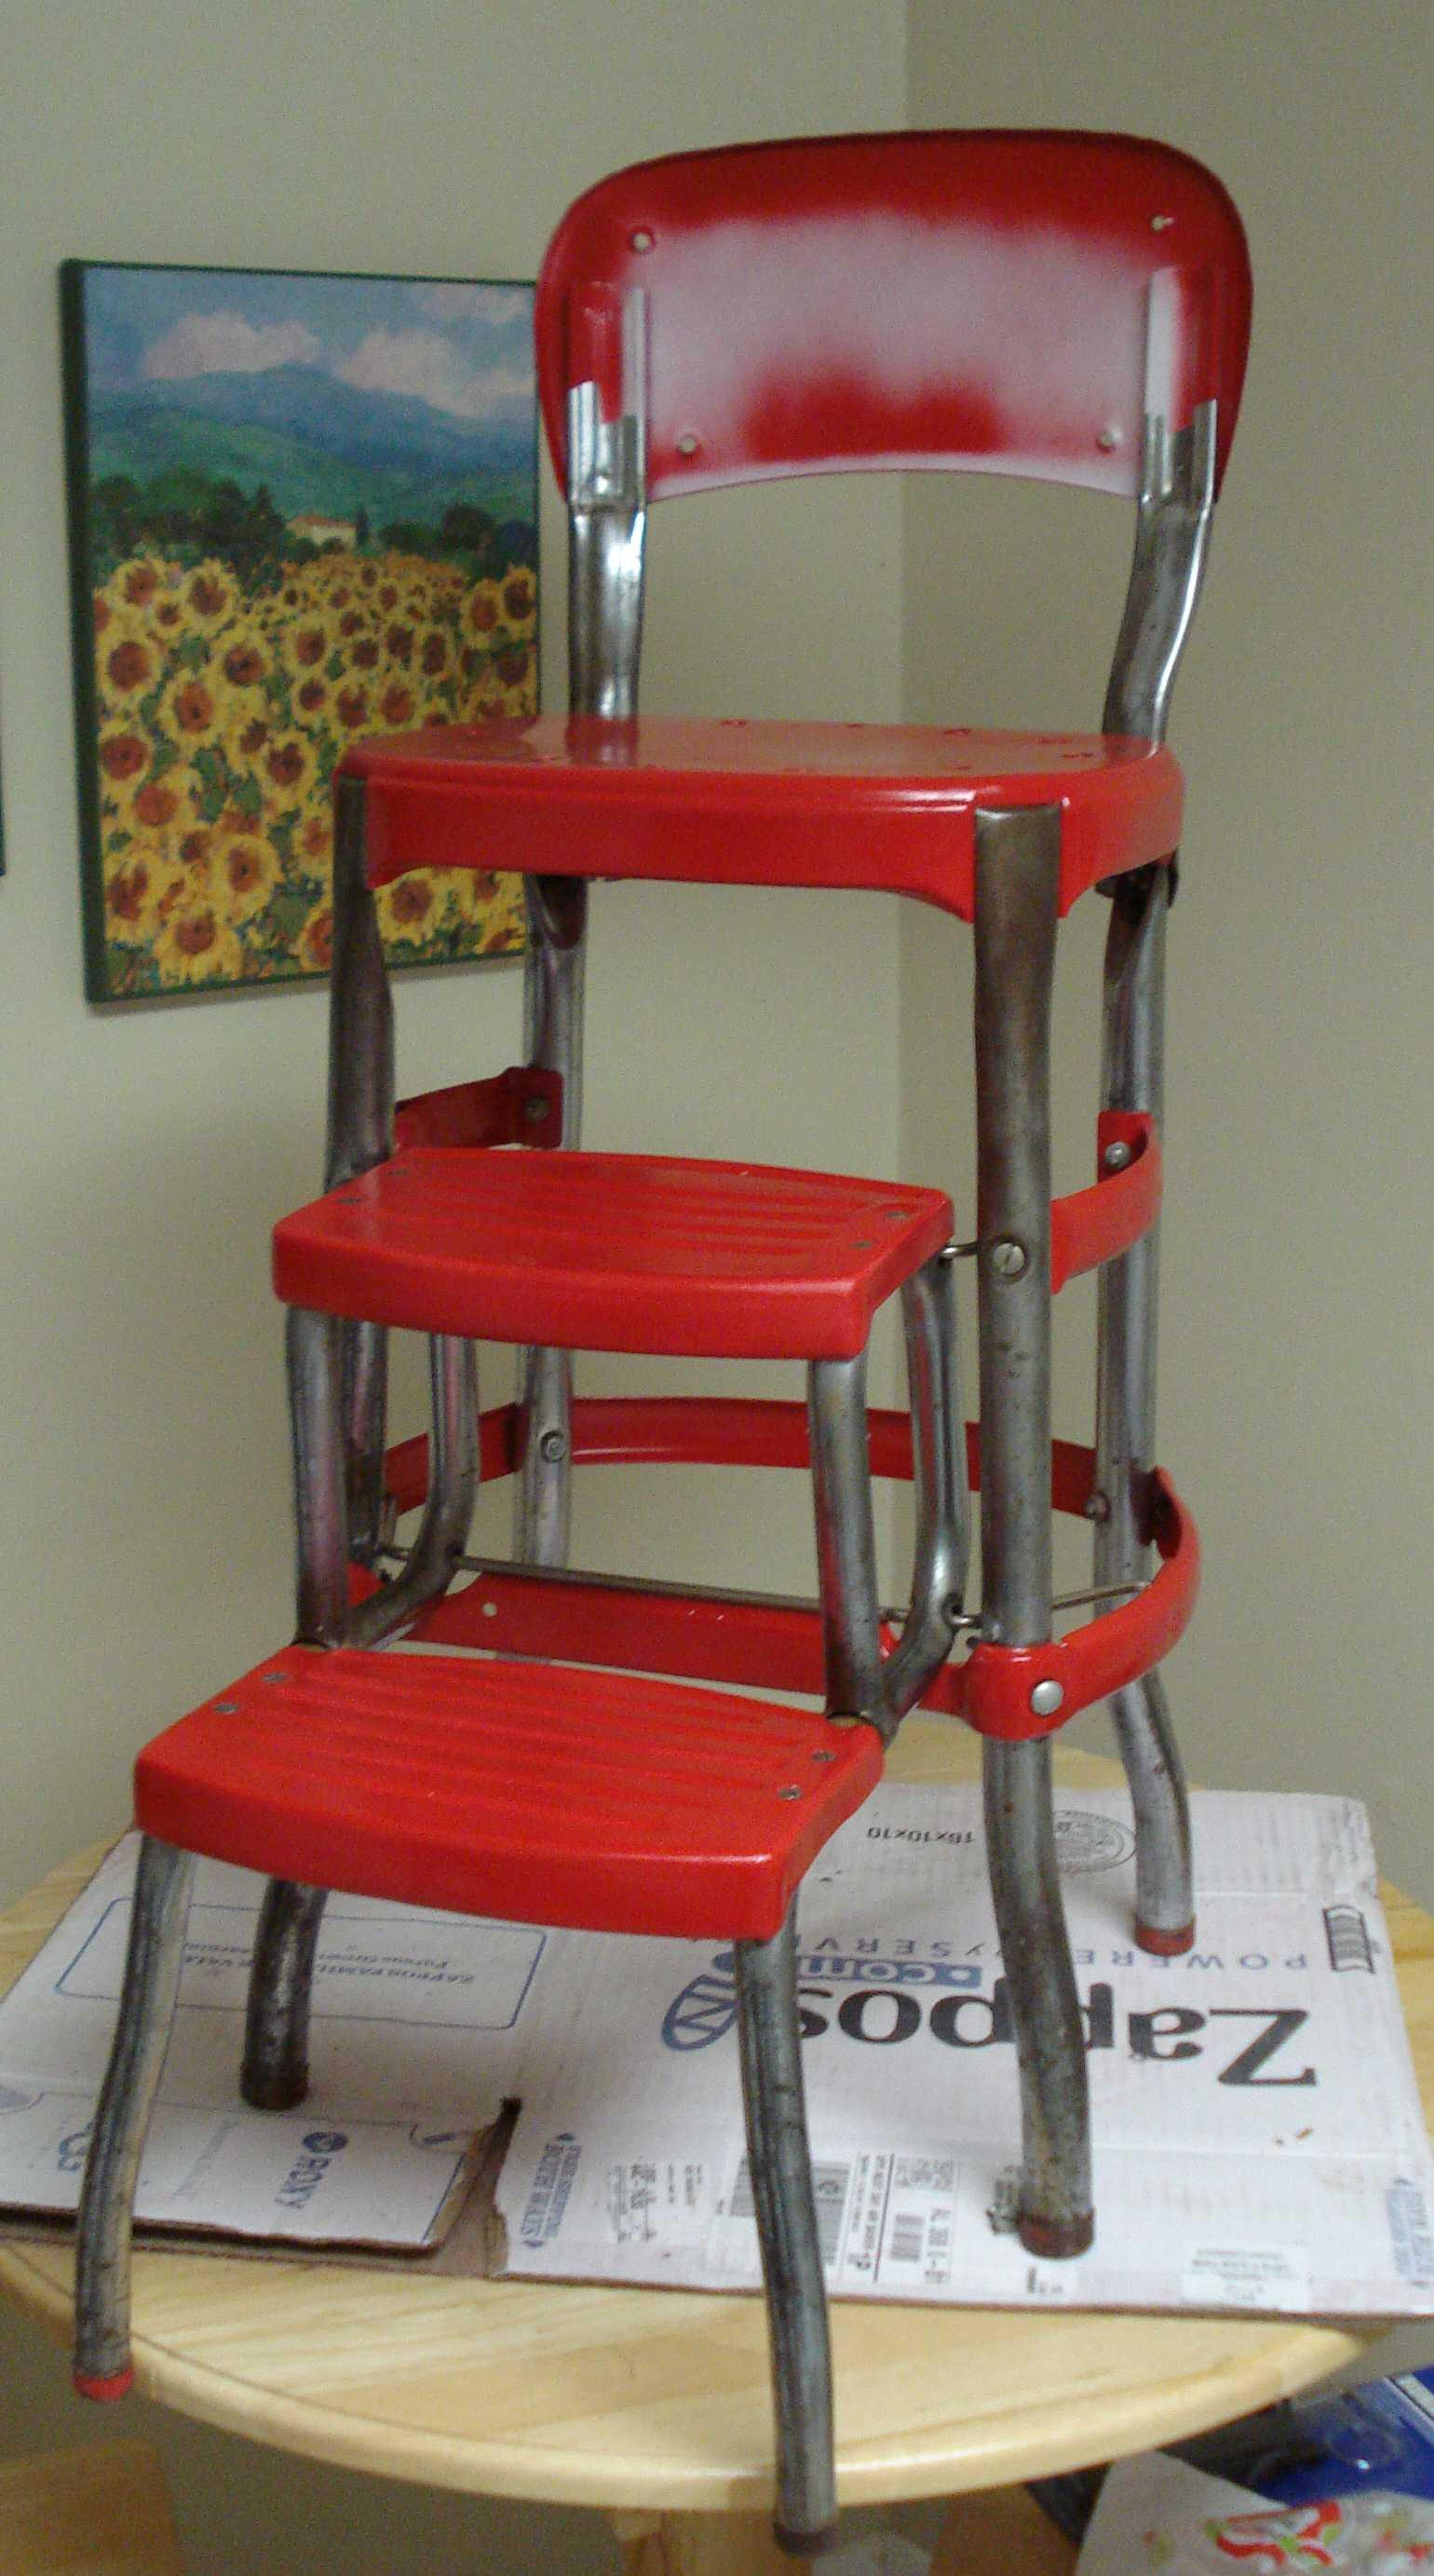 Cosco Step Ladder Chair Restoration  Visual Engineering